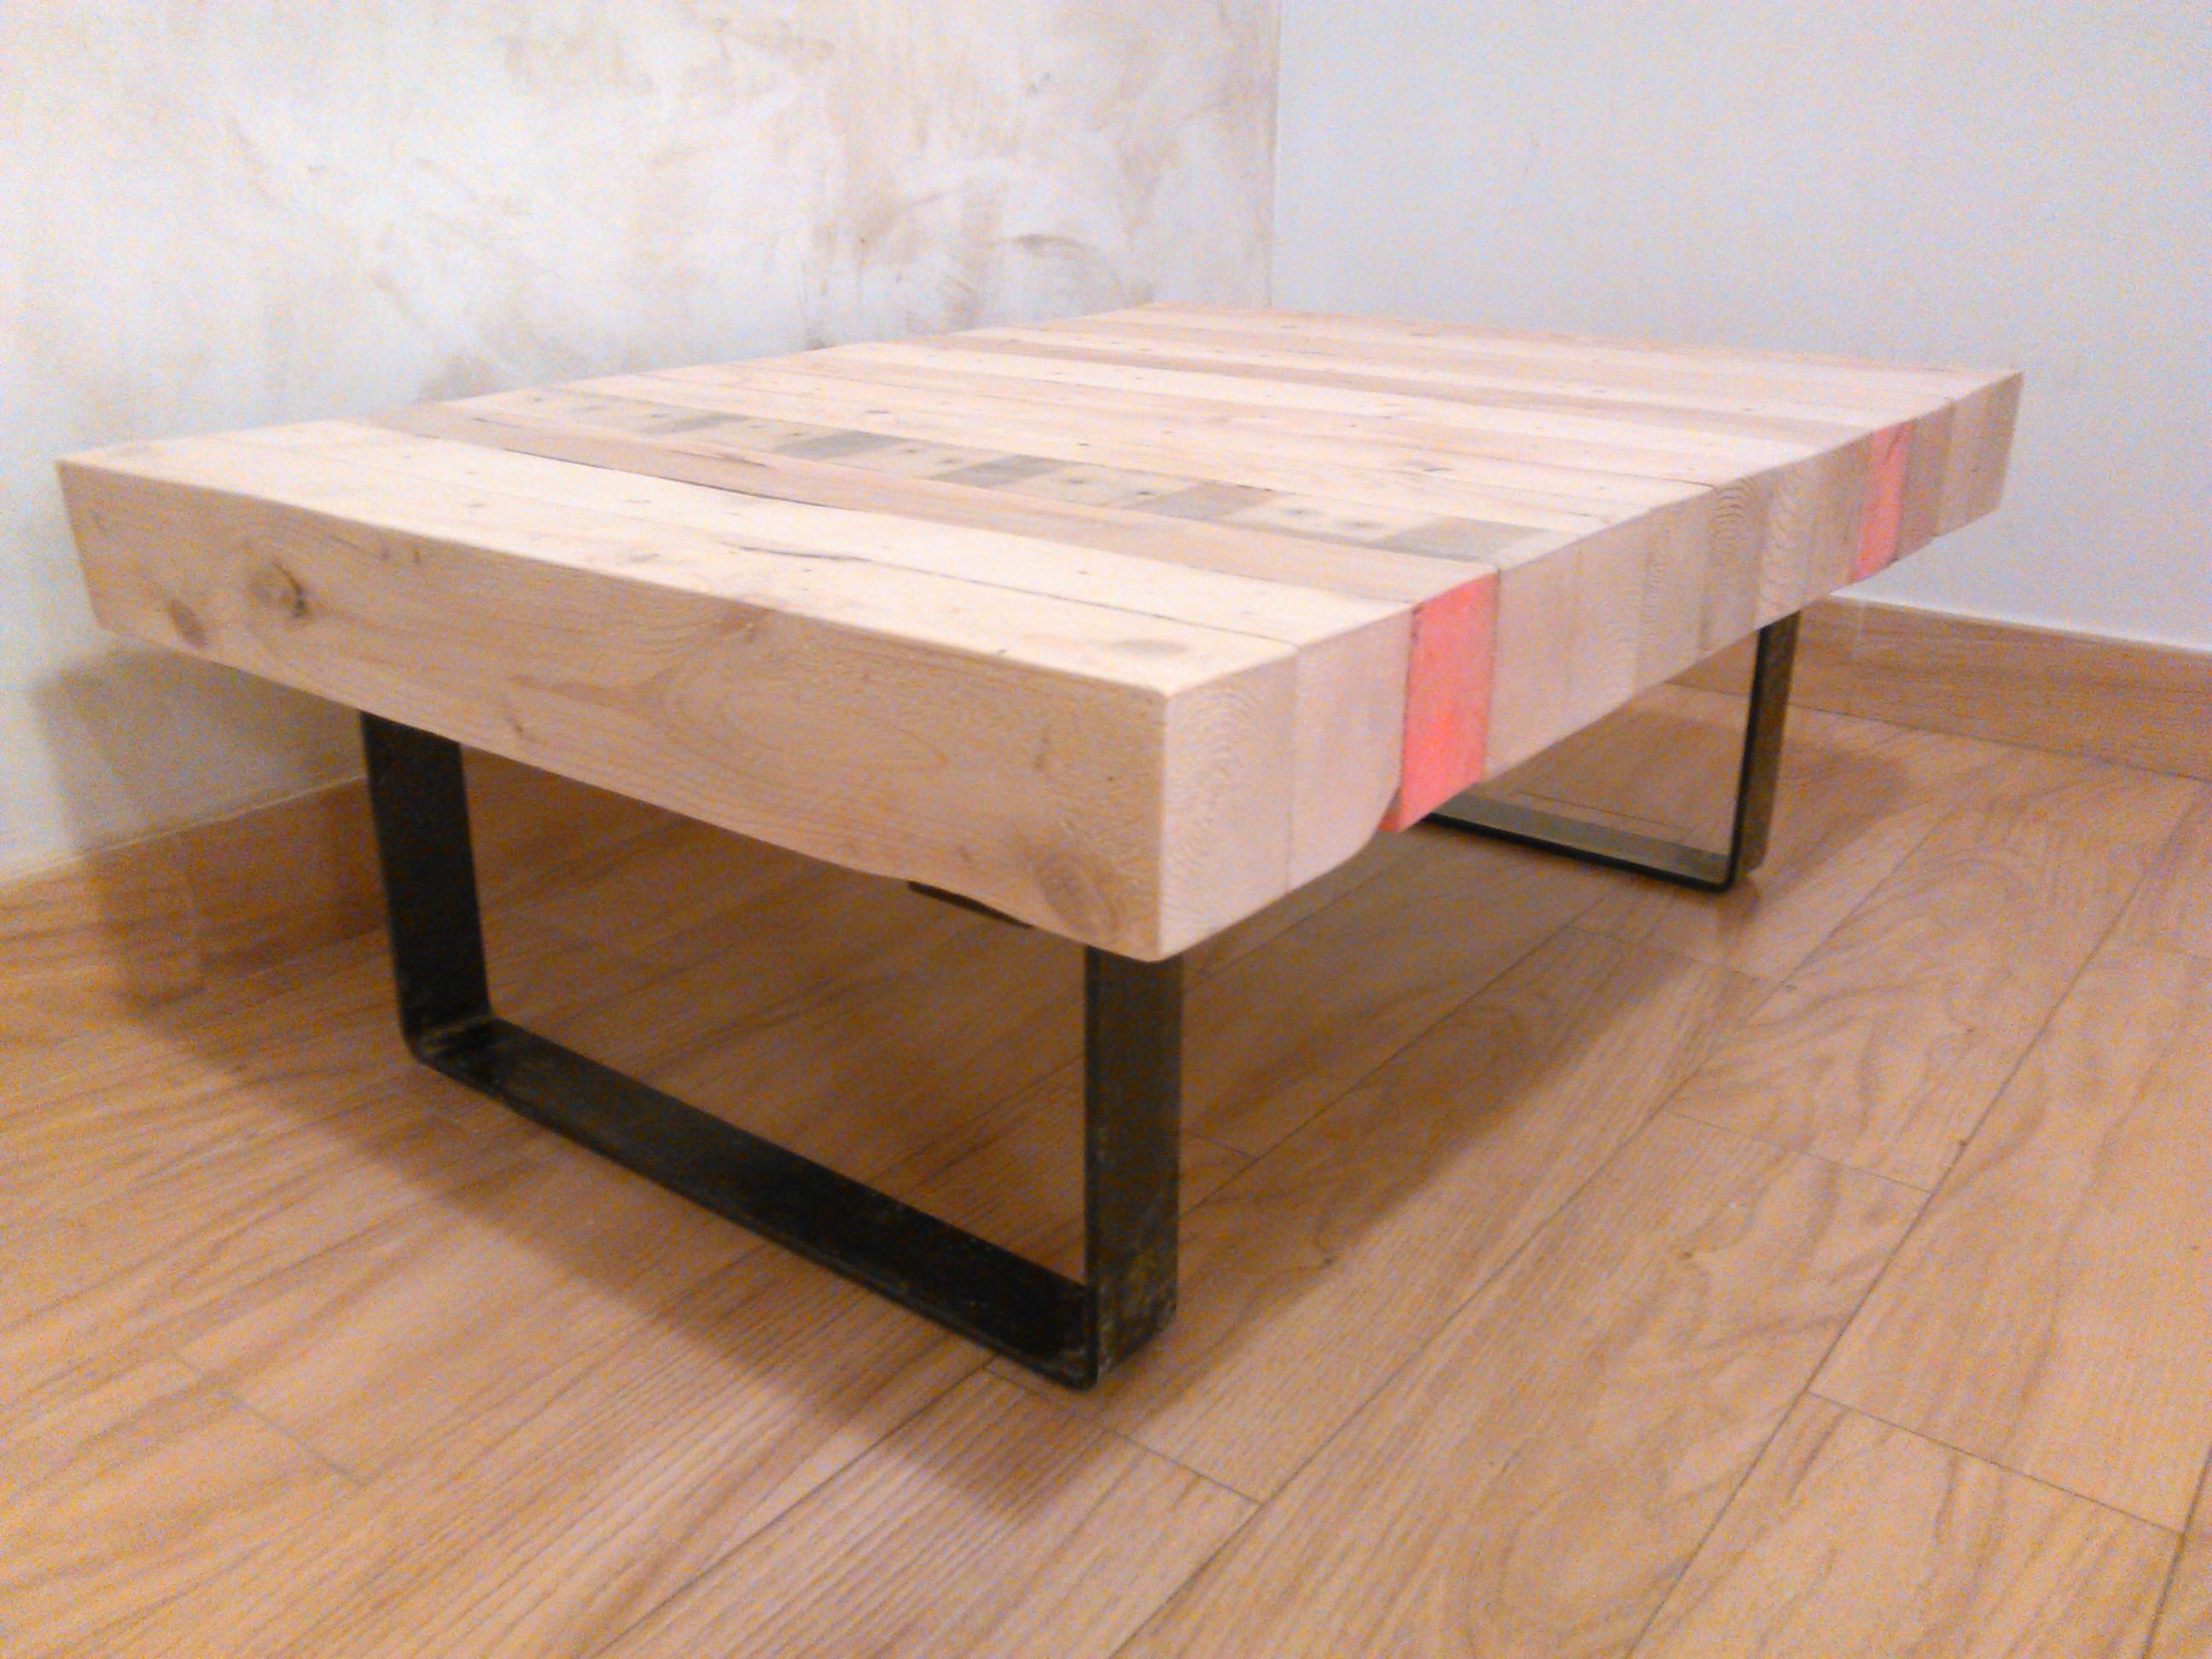 Mesa creada a partir de palés. Paleike.